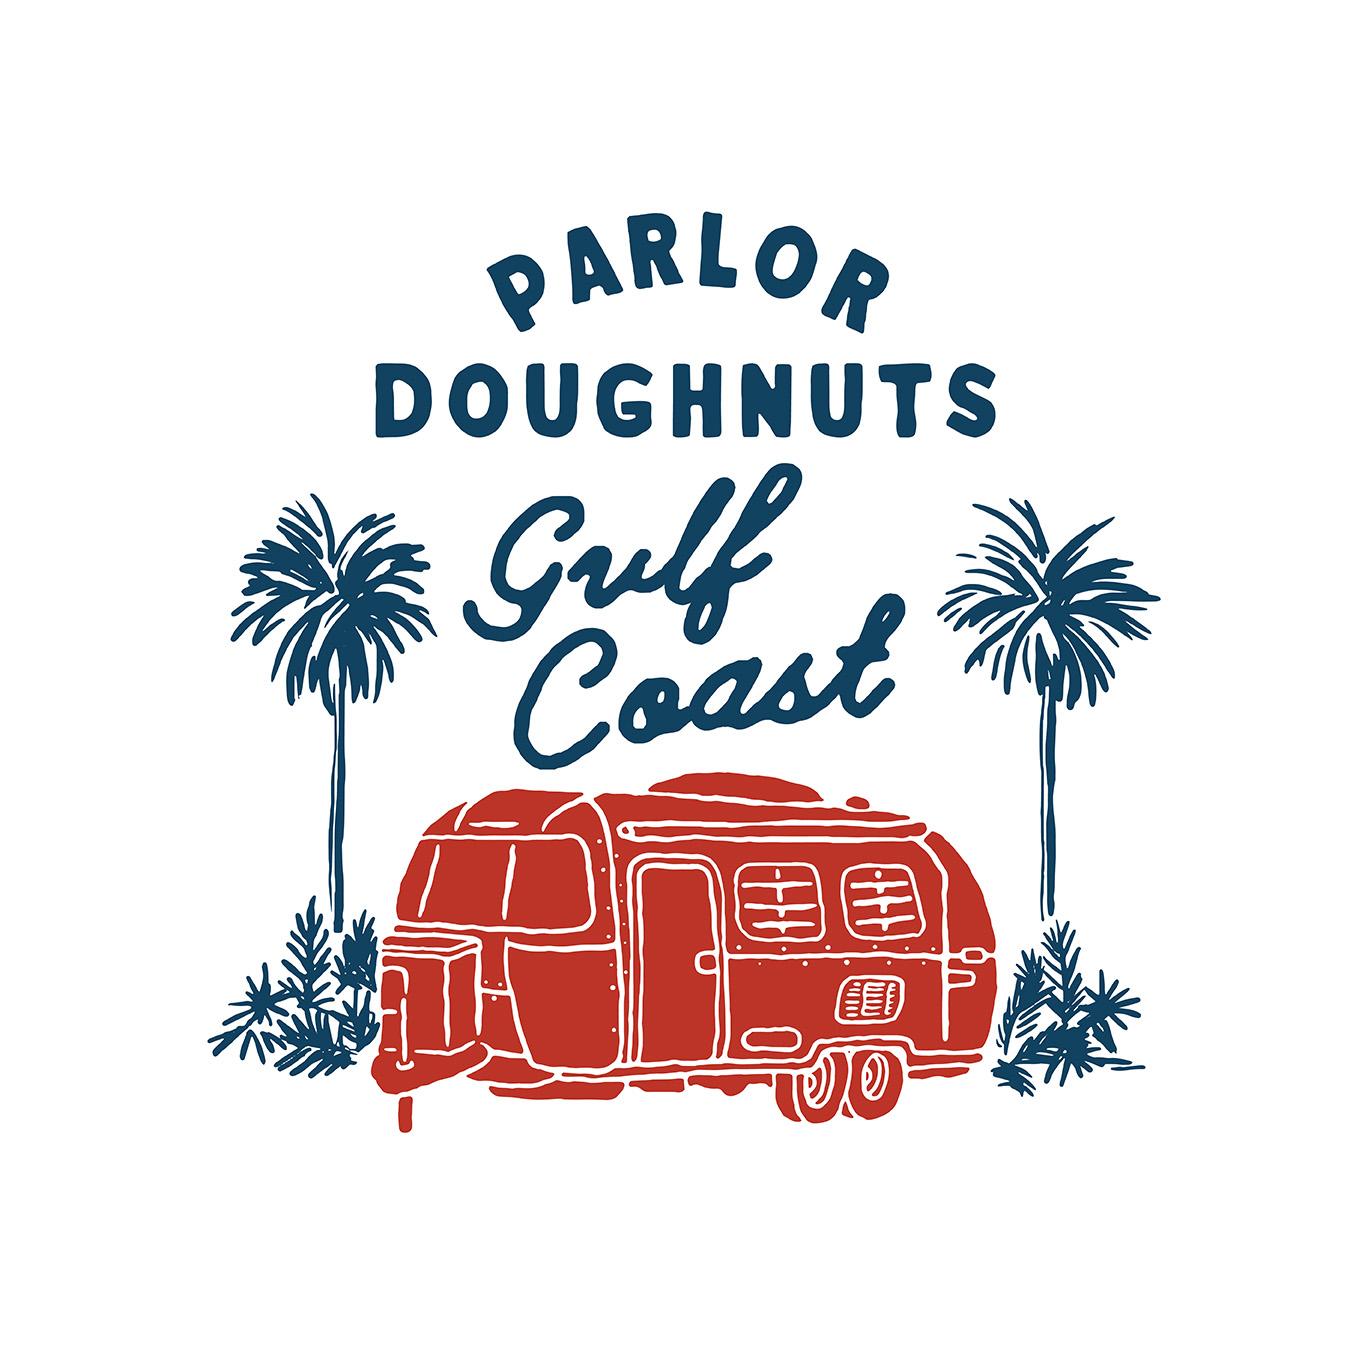 Parlor Doughnuts